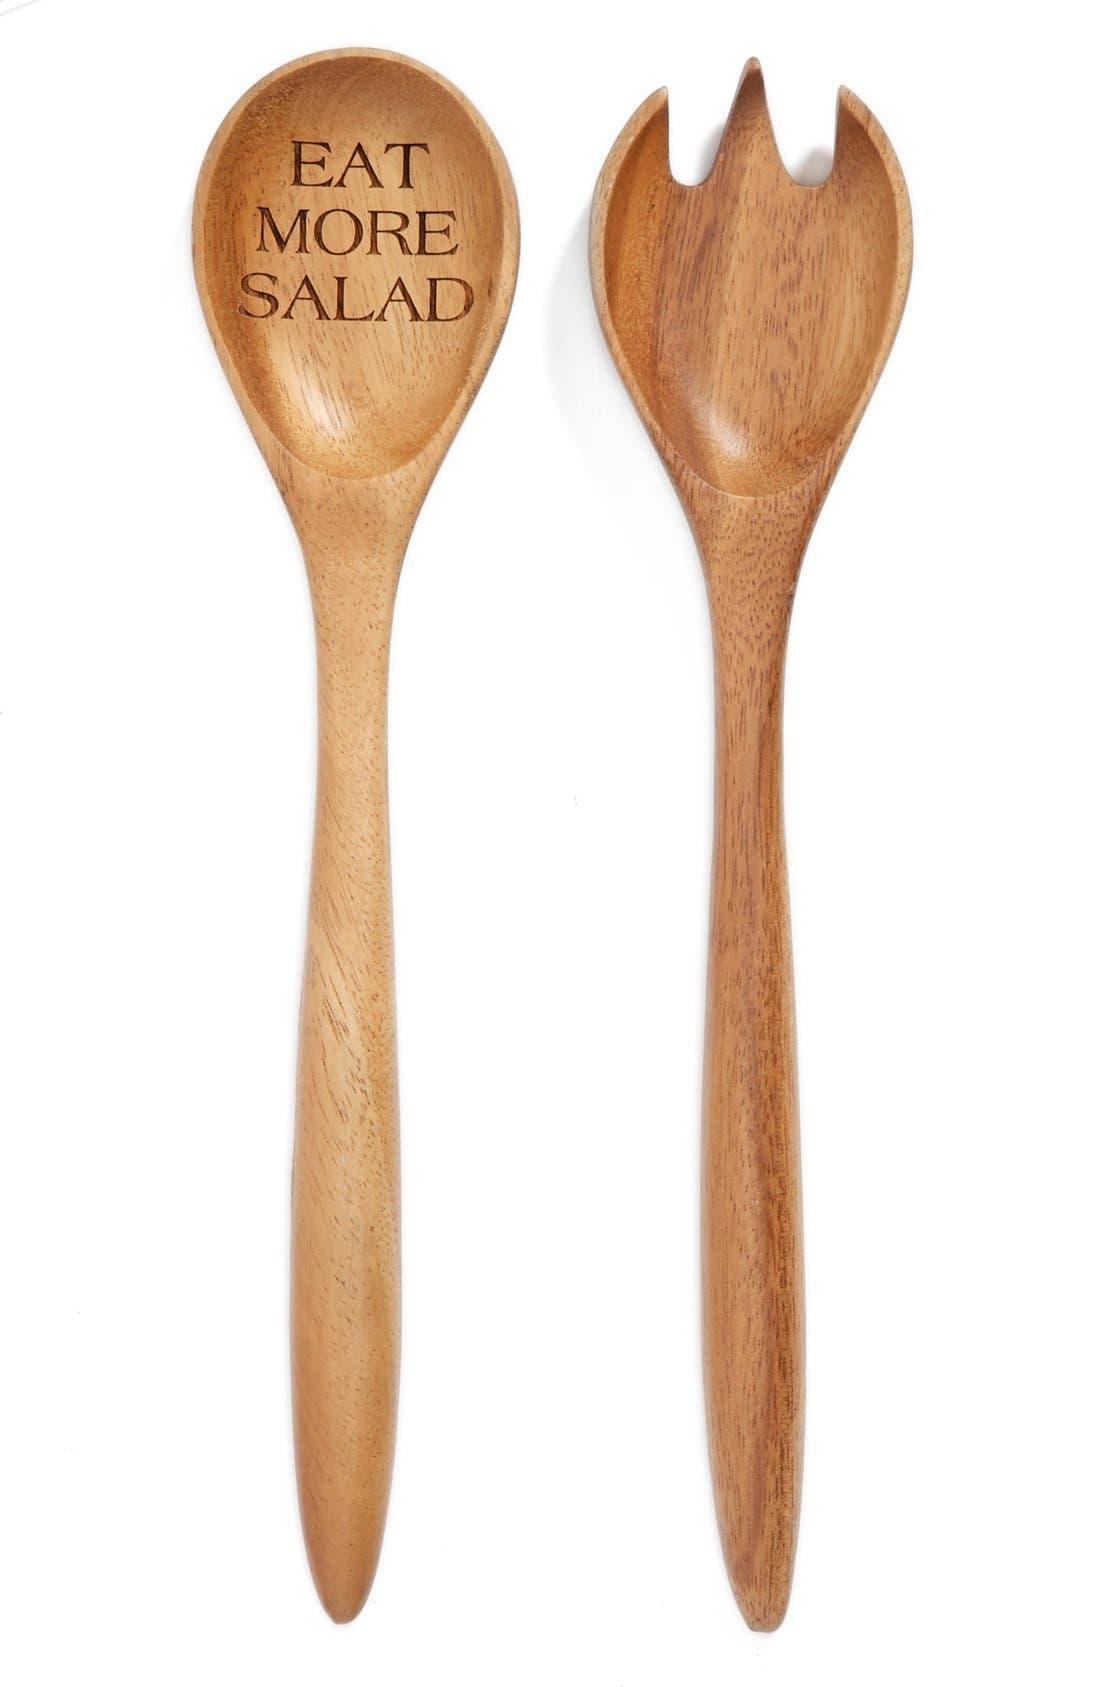 Main Image - Milk and Honey Luxuries 'Eat More Salad' Wooden 2-Piece Salad Serving Set